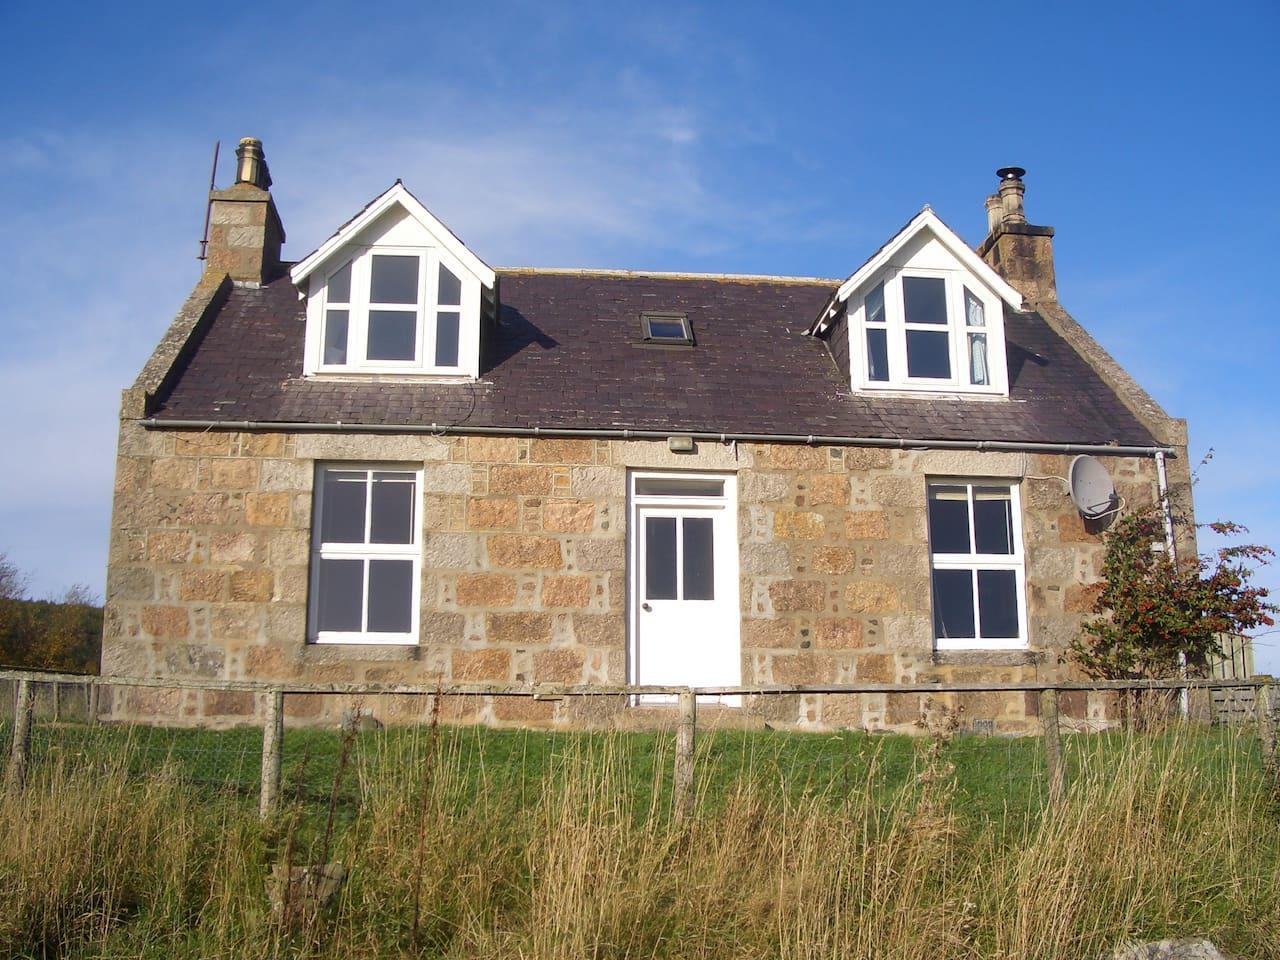 Coldhome Farmhouse